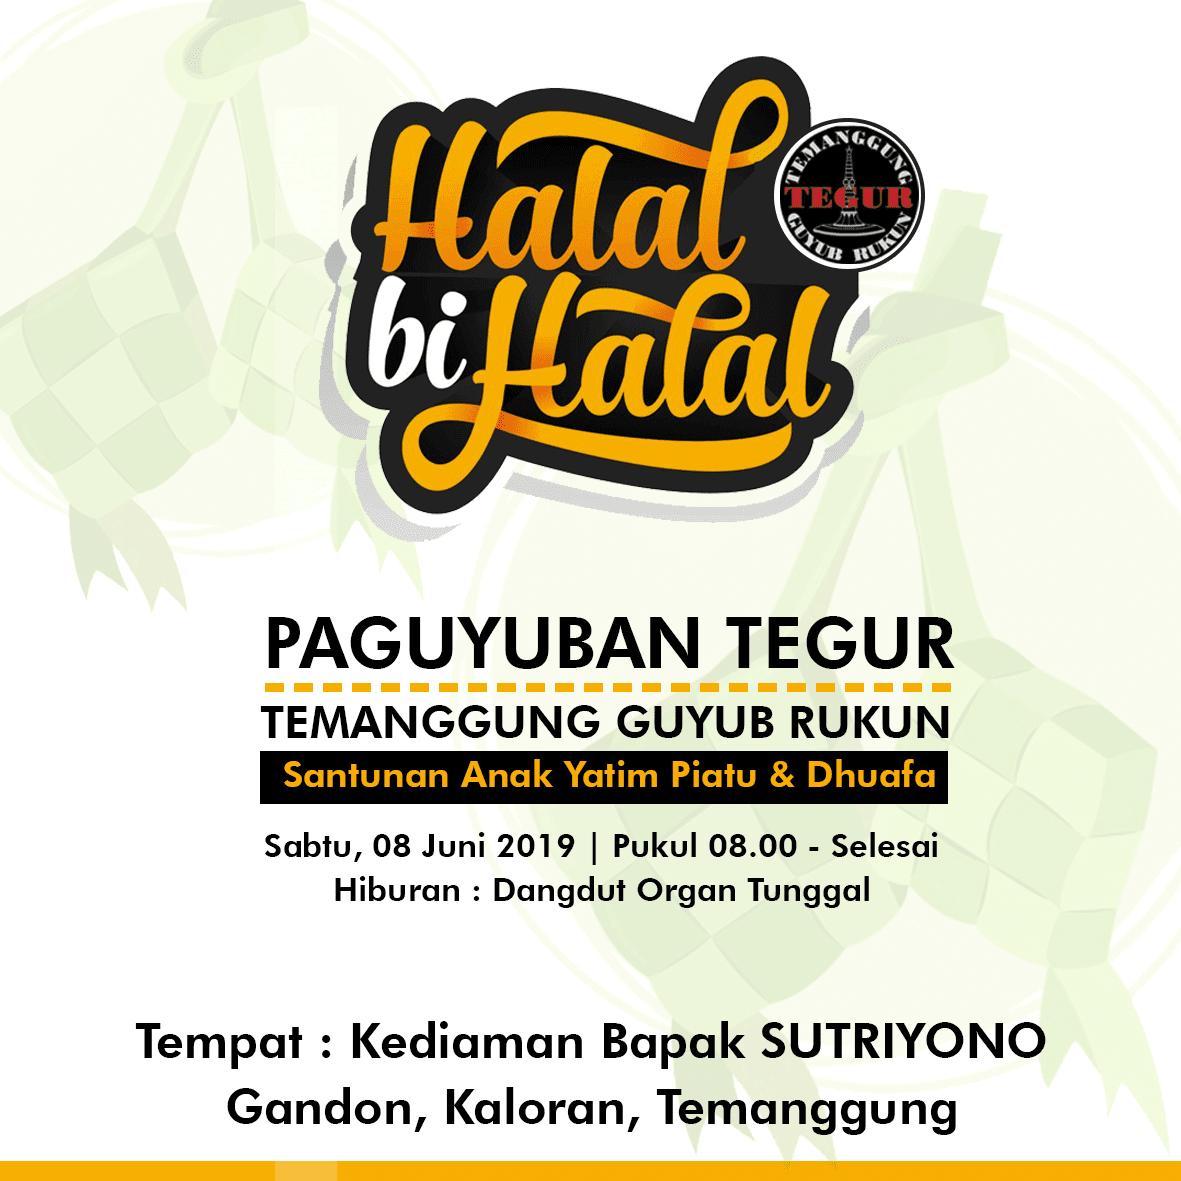 Kaos Spanduk Halal Bi Halal Hubungi 085219874895 Honion Jiddane